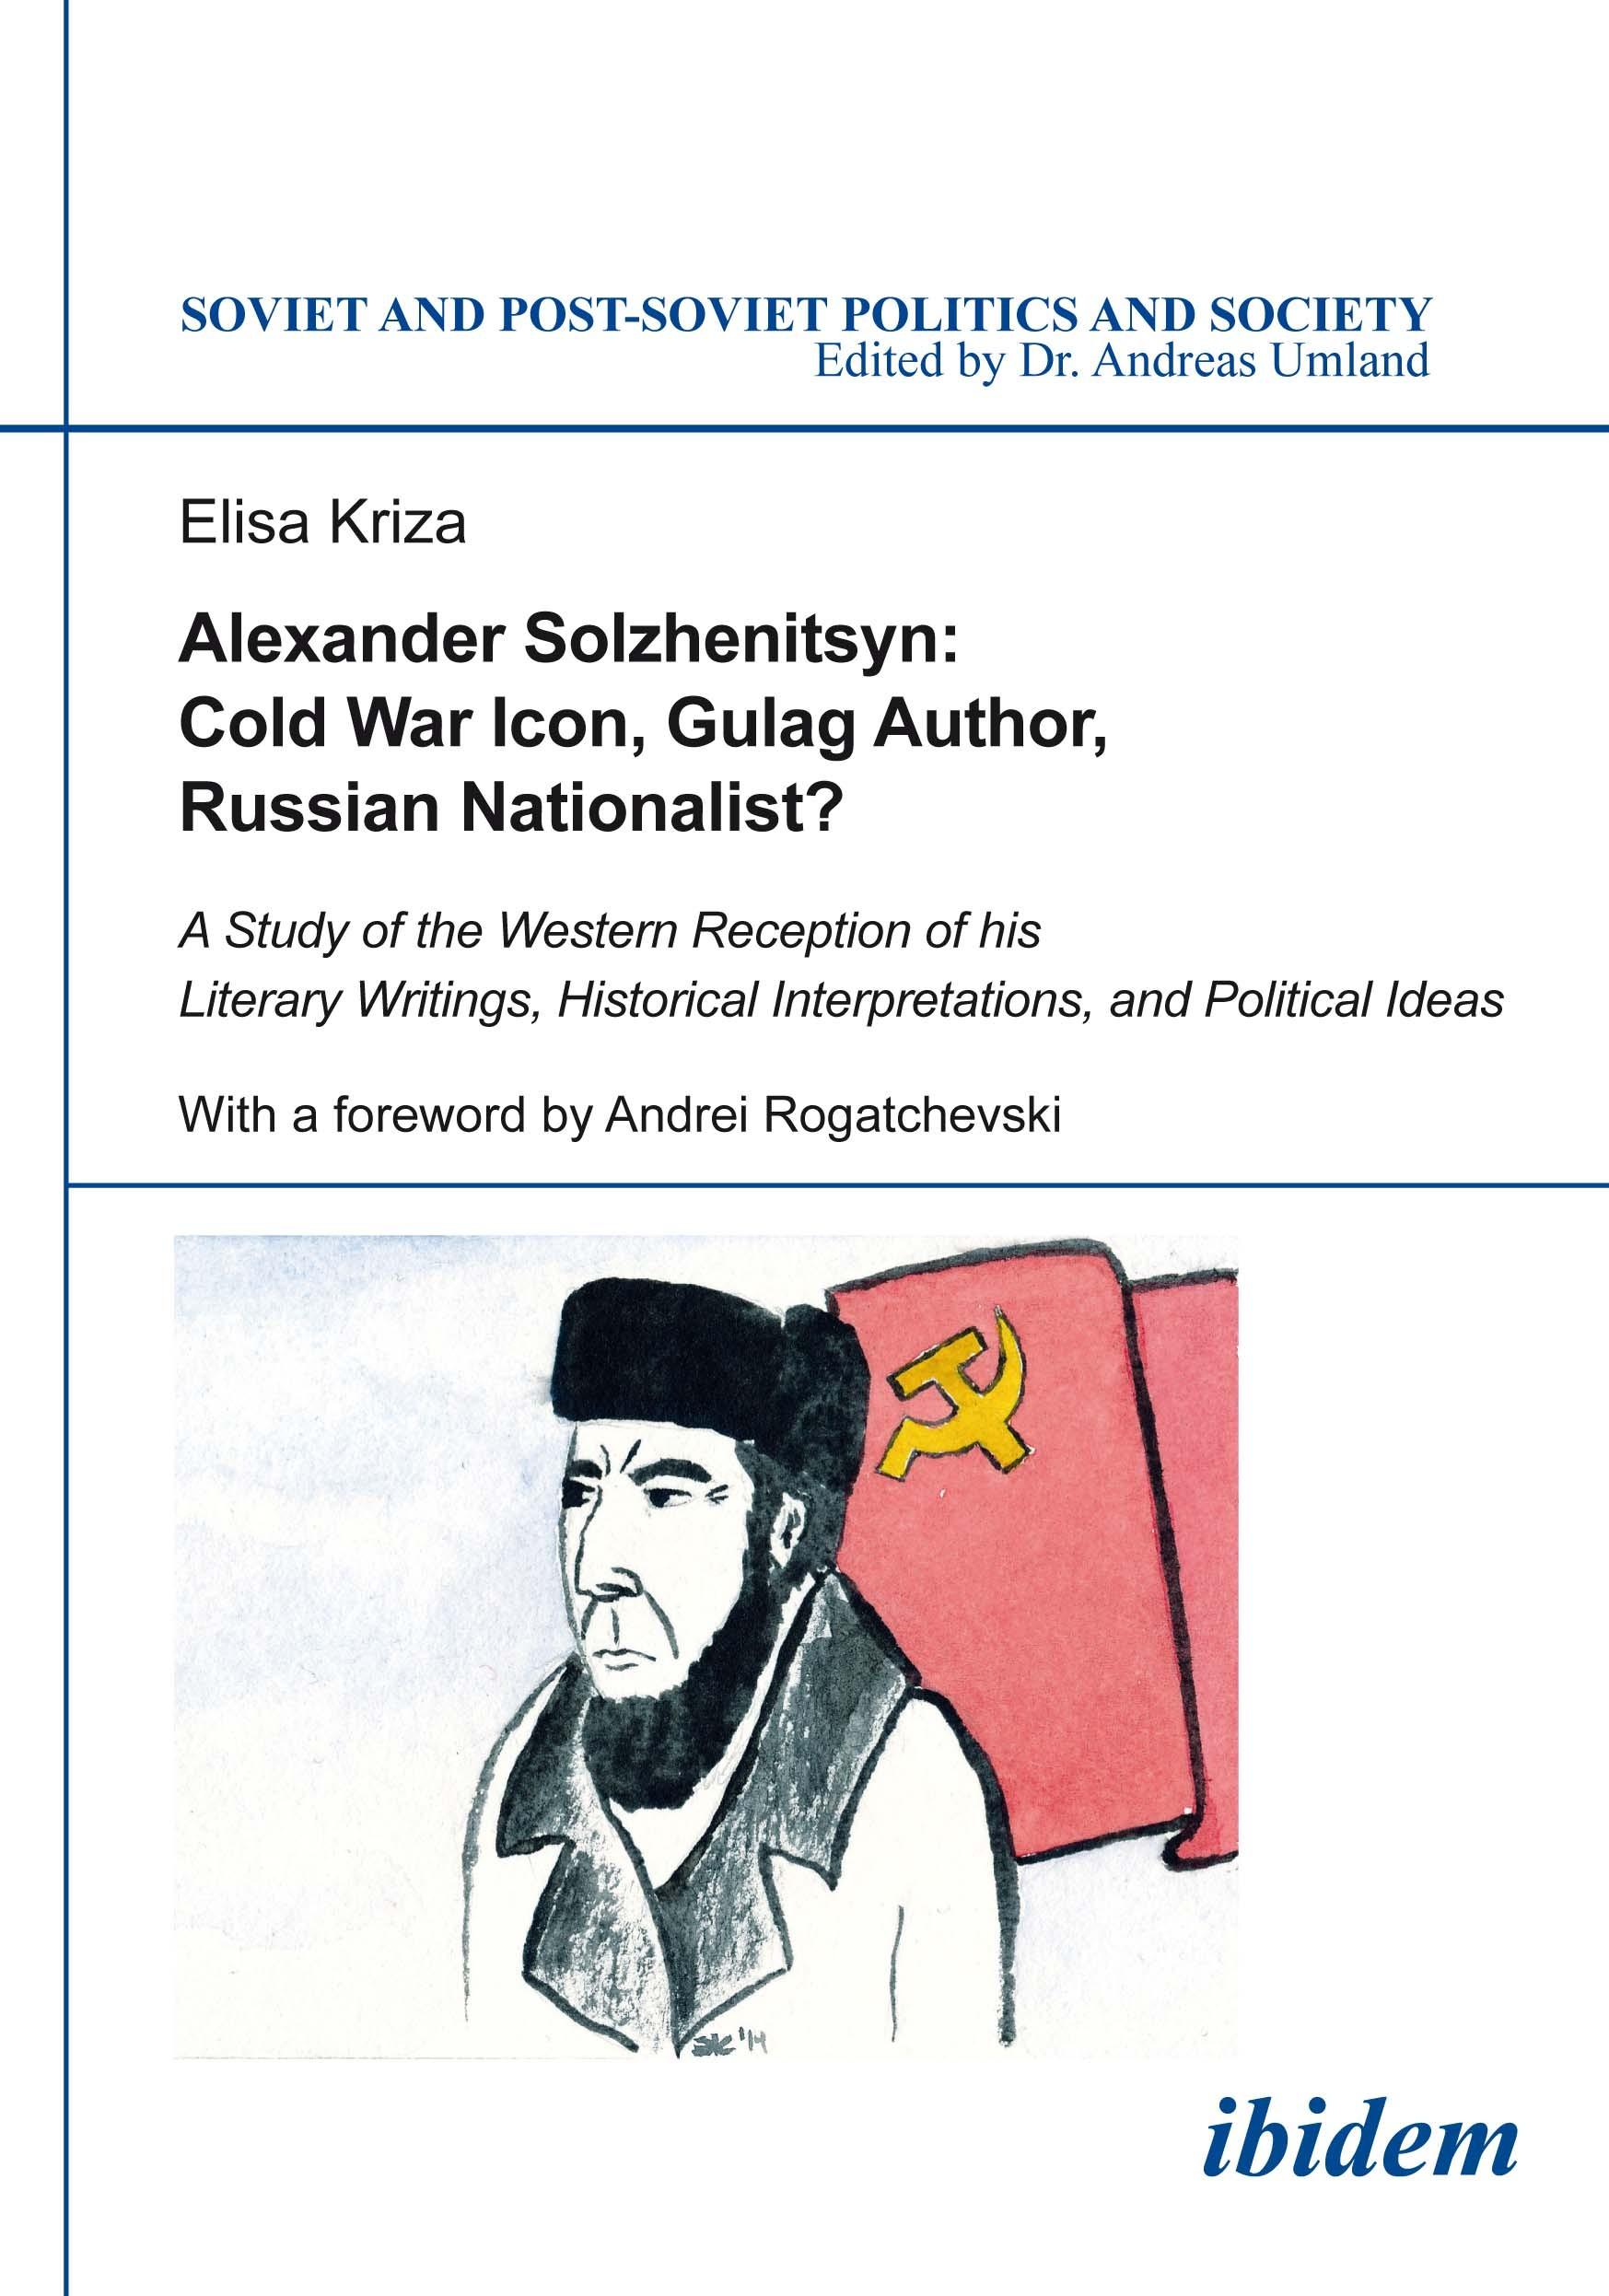 Alexander Solzhenitsyn: Cold War Icon, Gulag Author, Russian Nationalist?